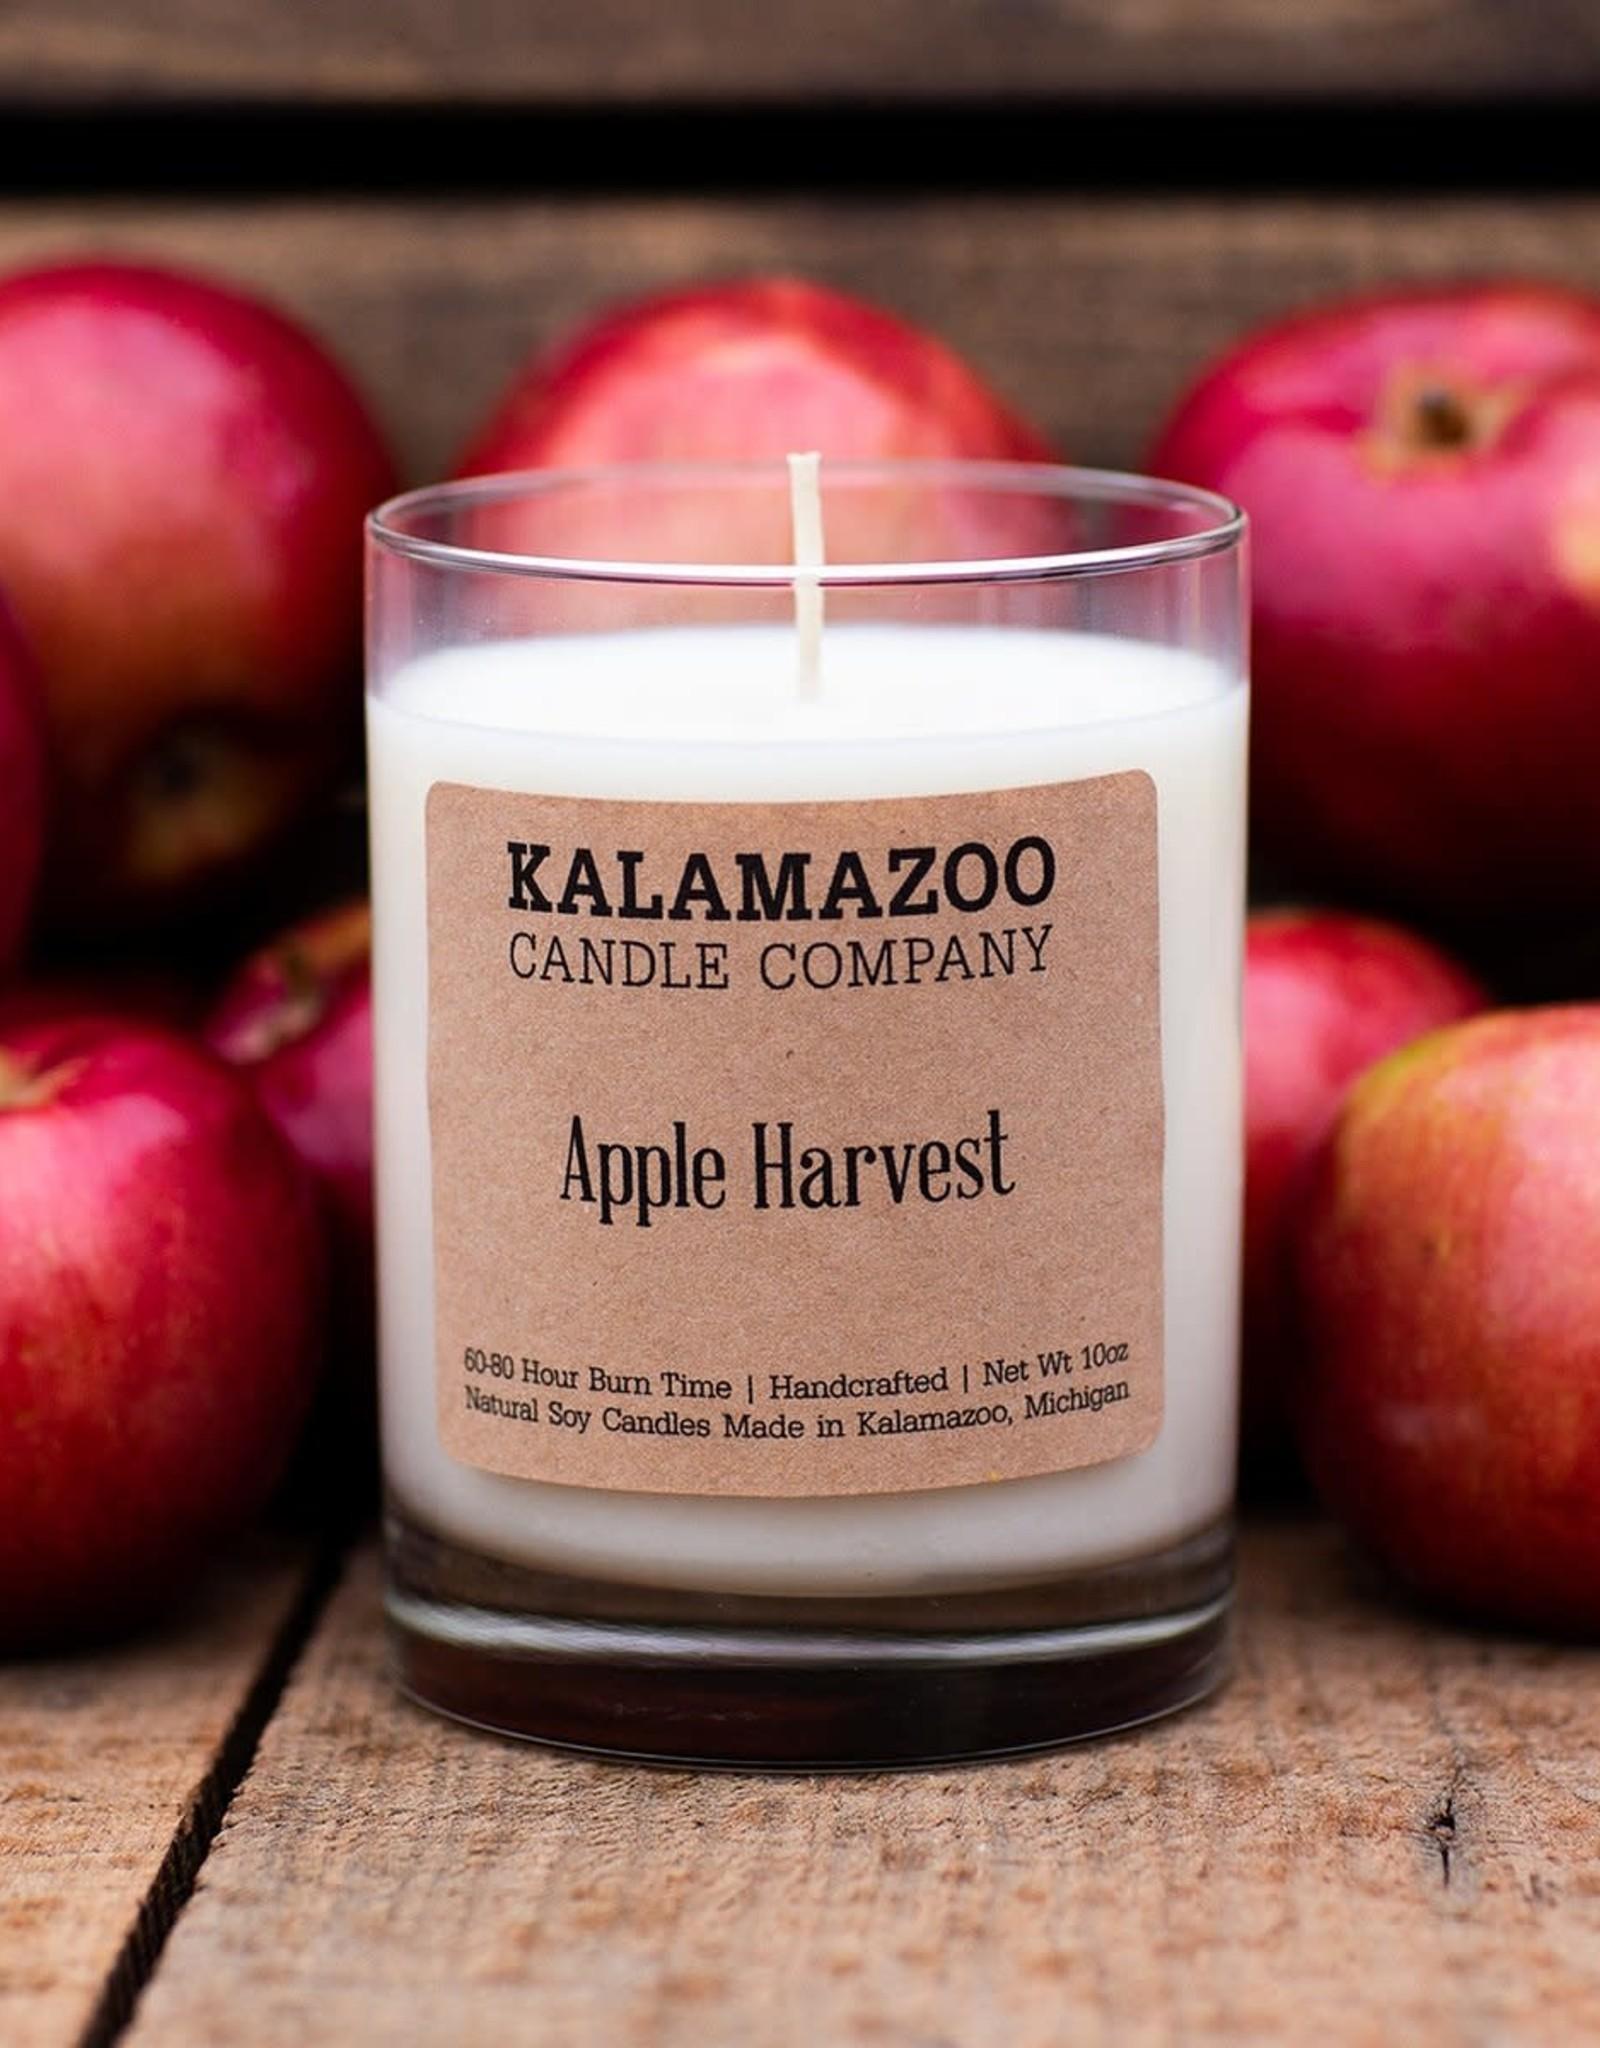 Kalamazoo Candle Co. Kalamazoo Candle Co. | Apple Harvest 10oz Jar